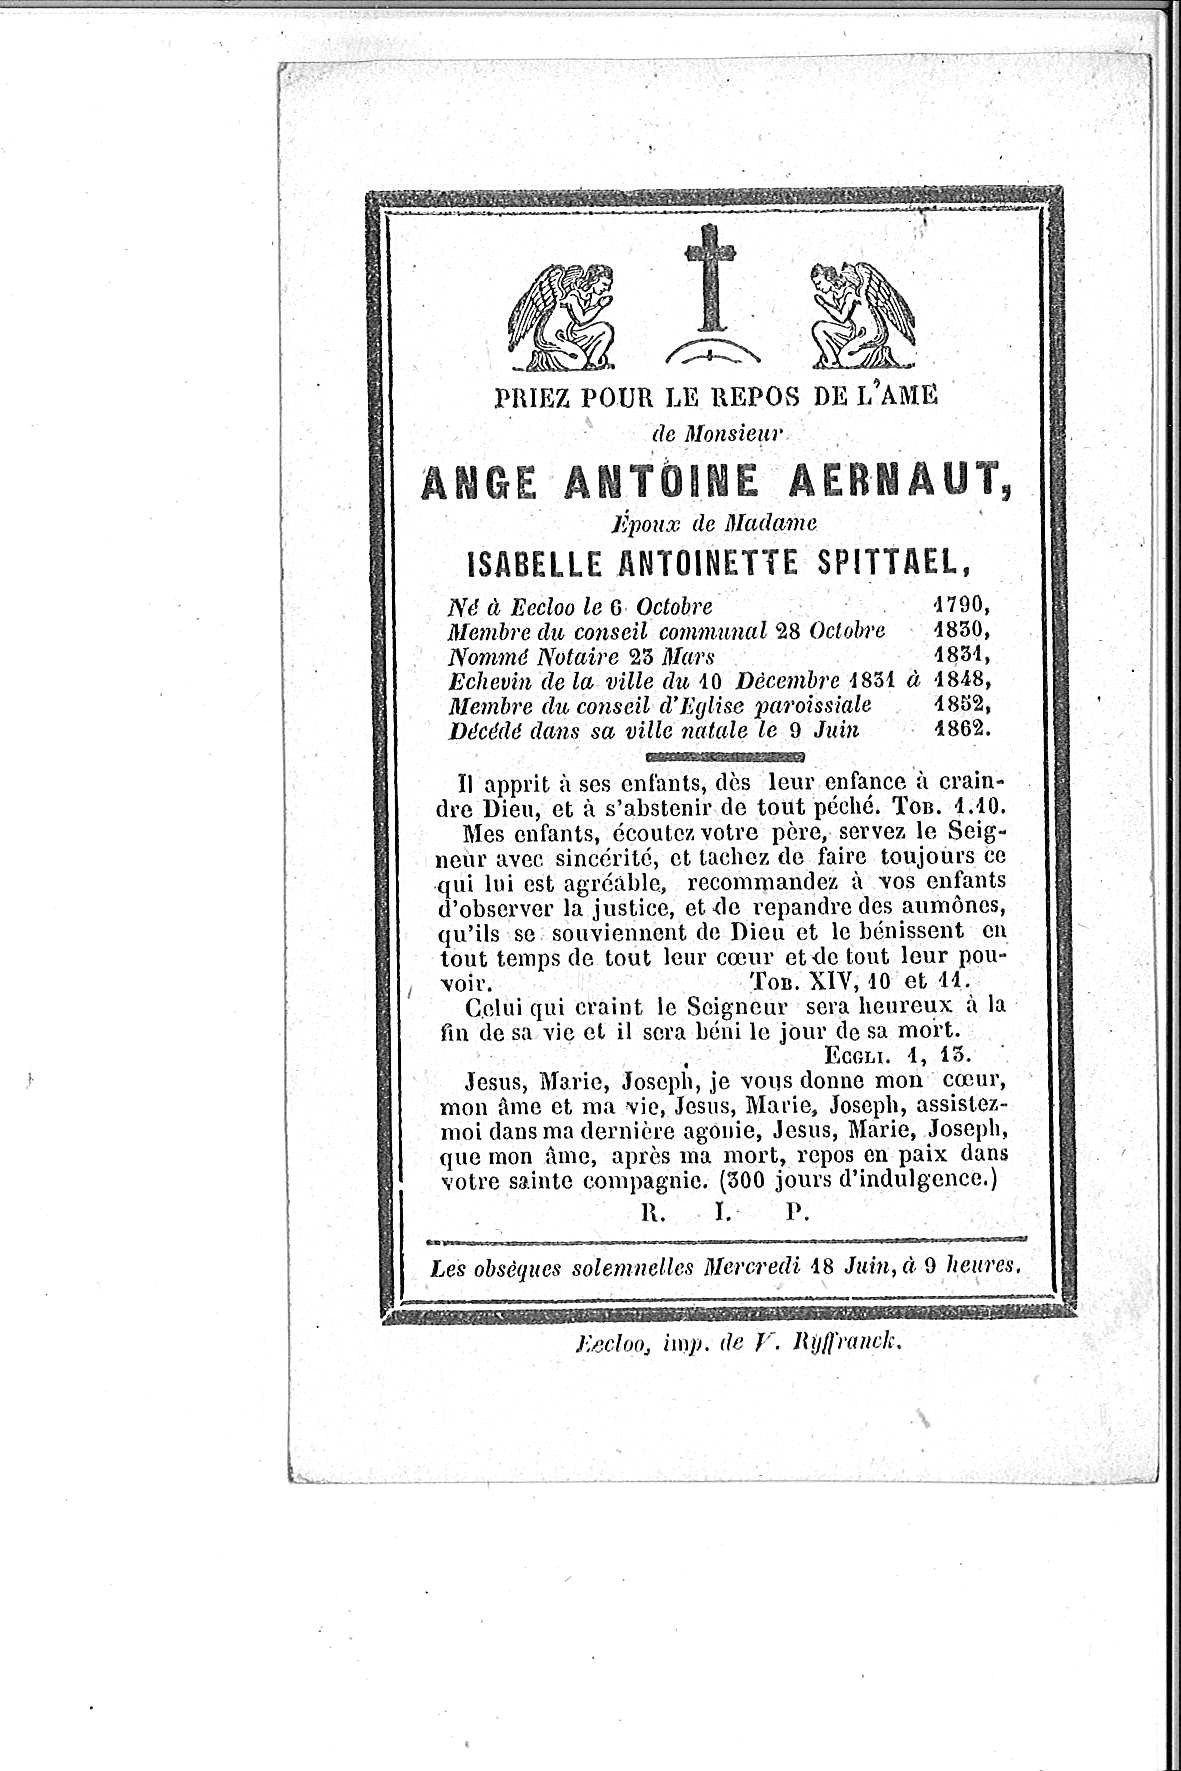 Aernaut Ange-Antoine